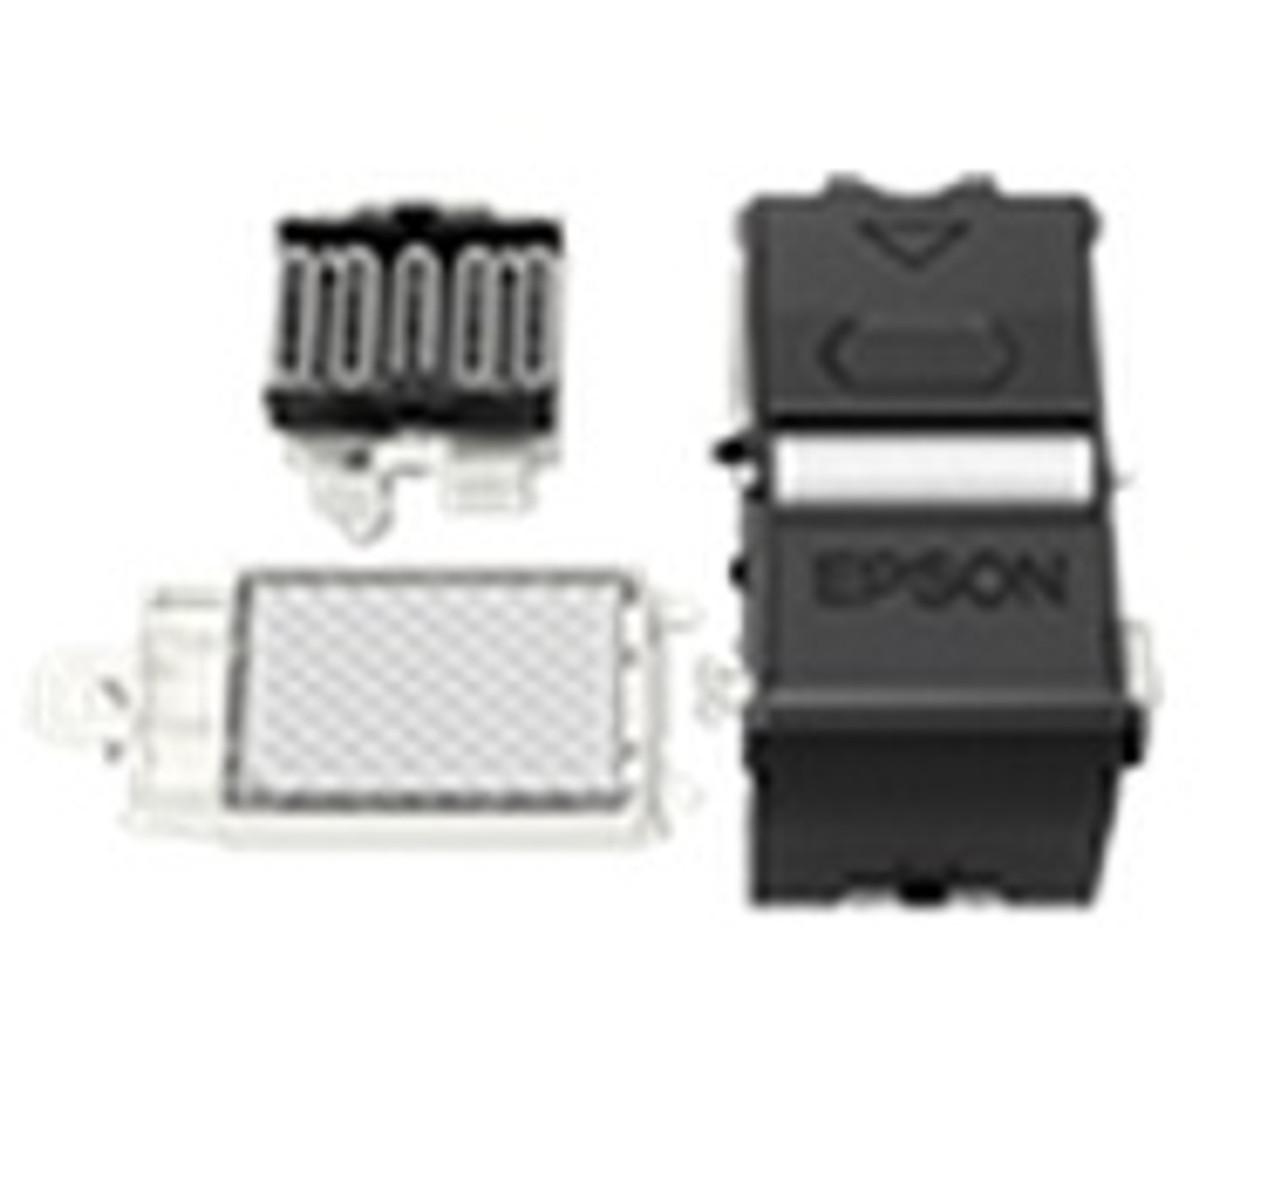 Epson F2000/F2100 Print Head Cleaning Kit